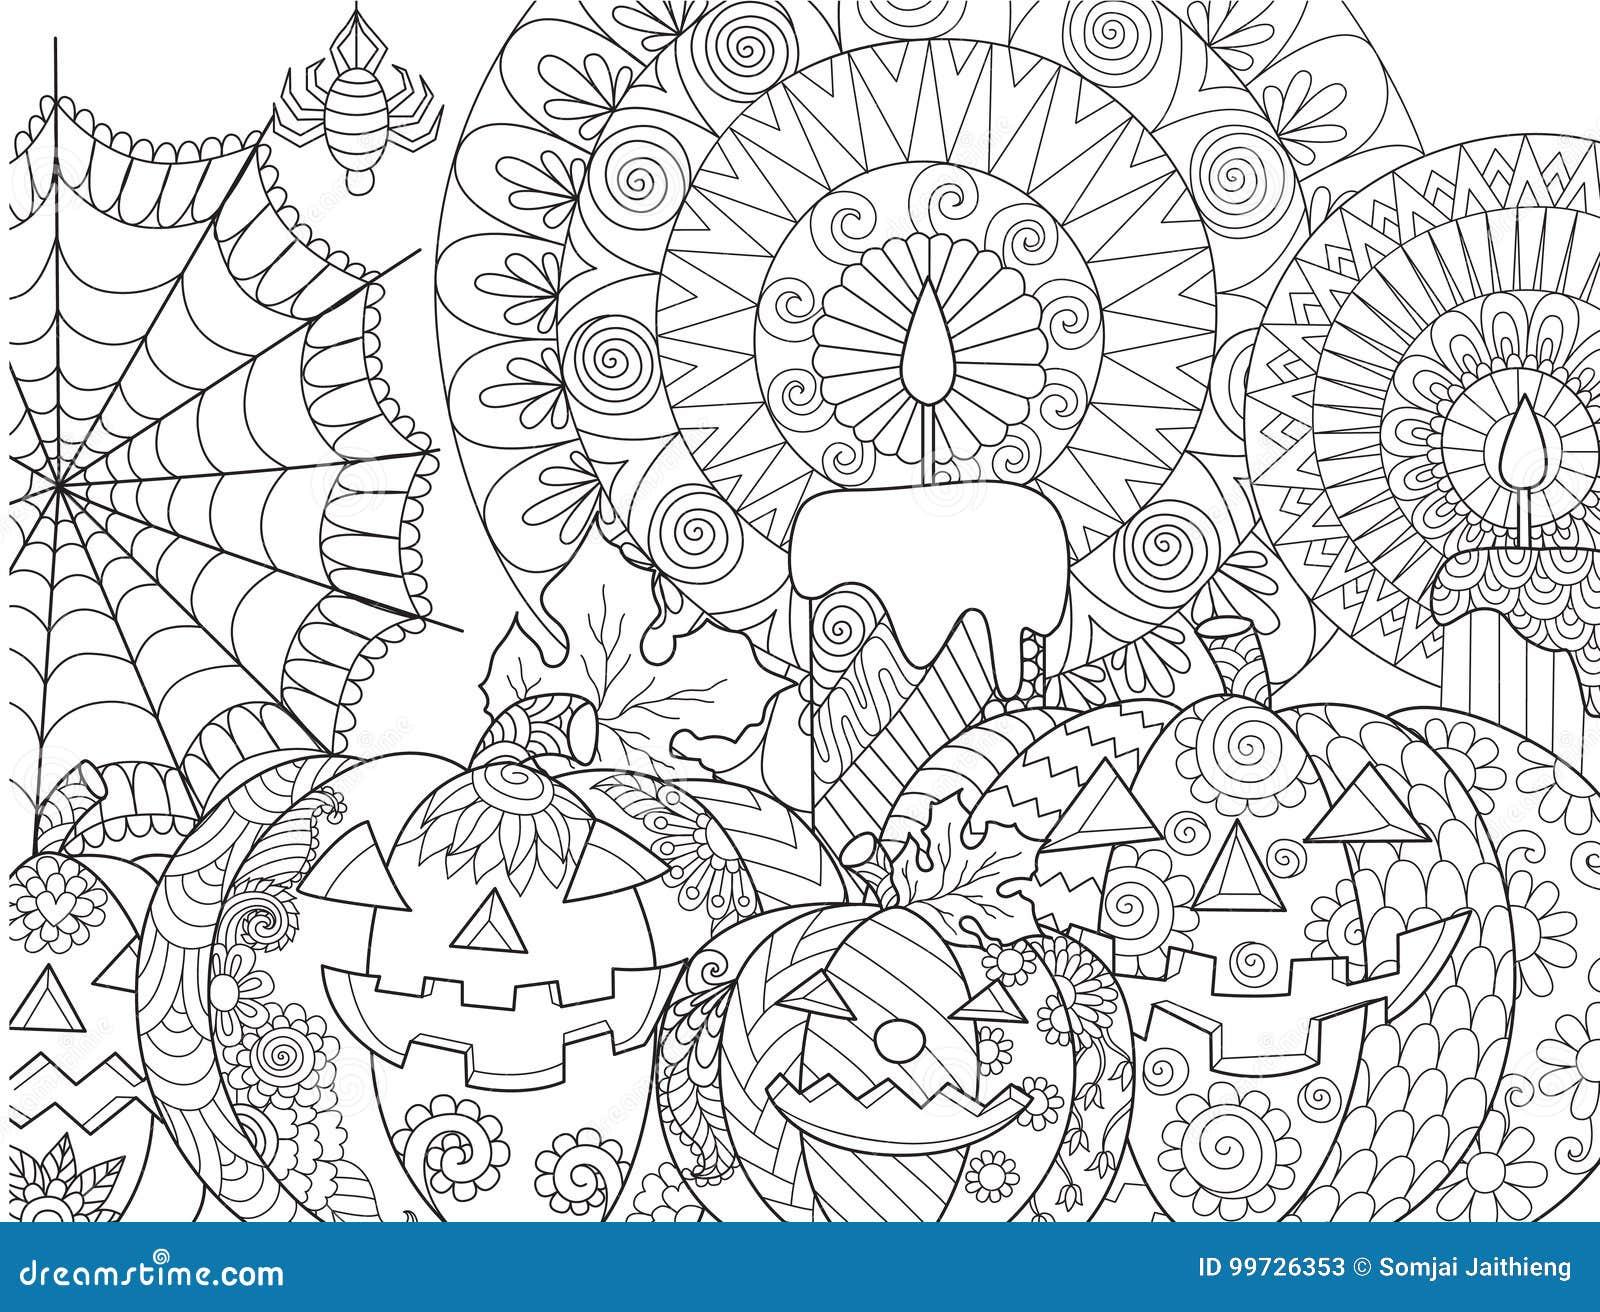 Halloween pumpkin coloring stock vector. Illustration of leaf - 99726353